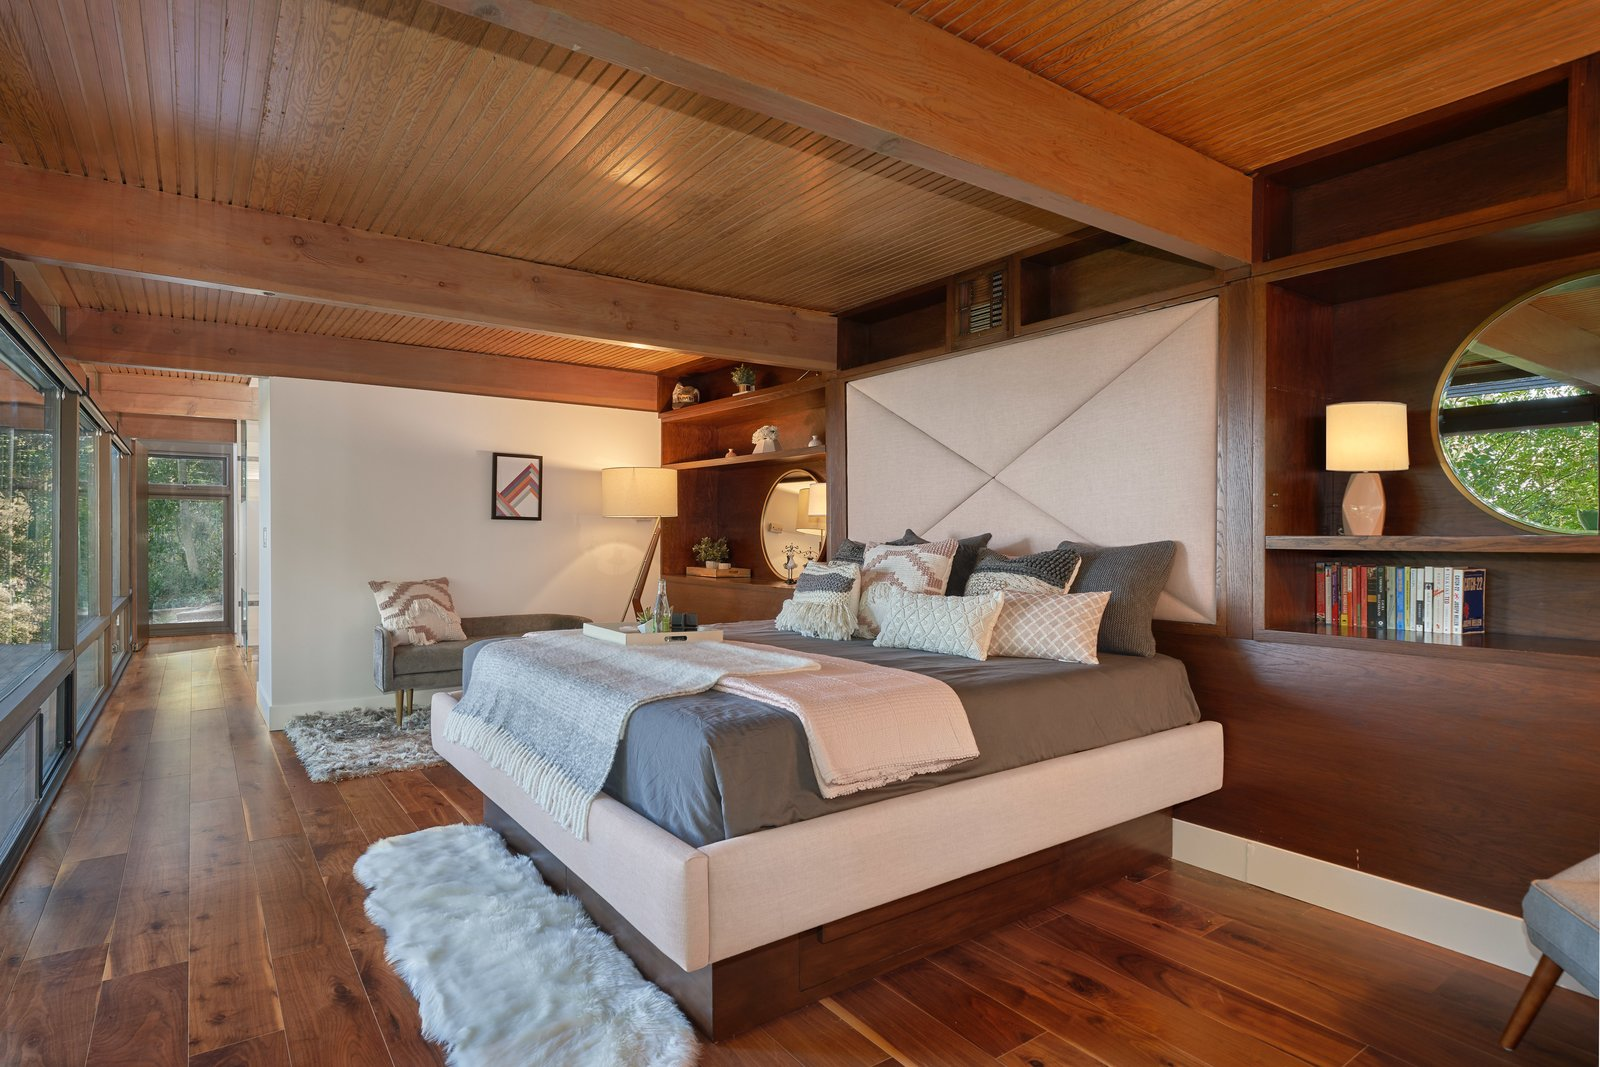 Millard Kaufman Residence master suite